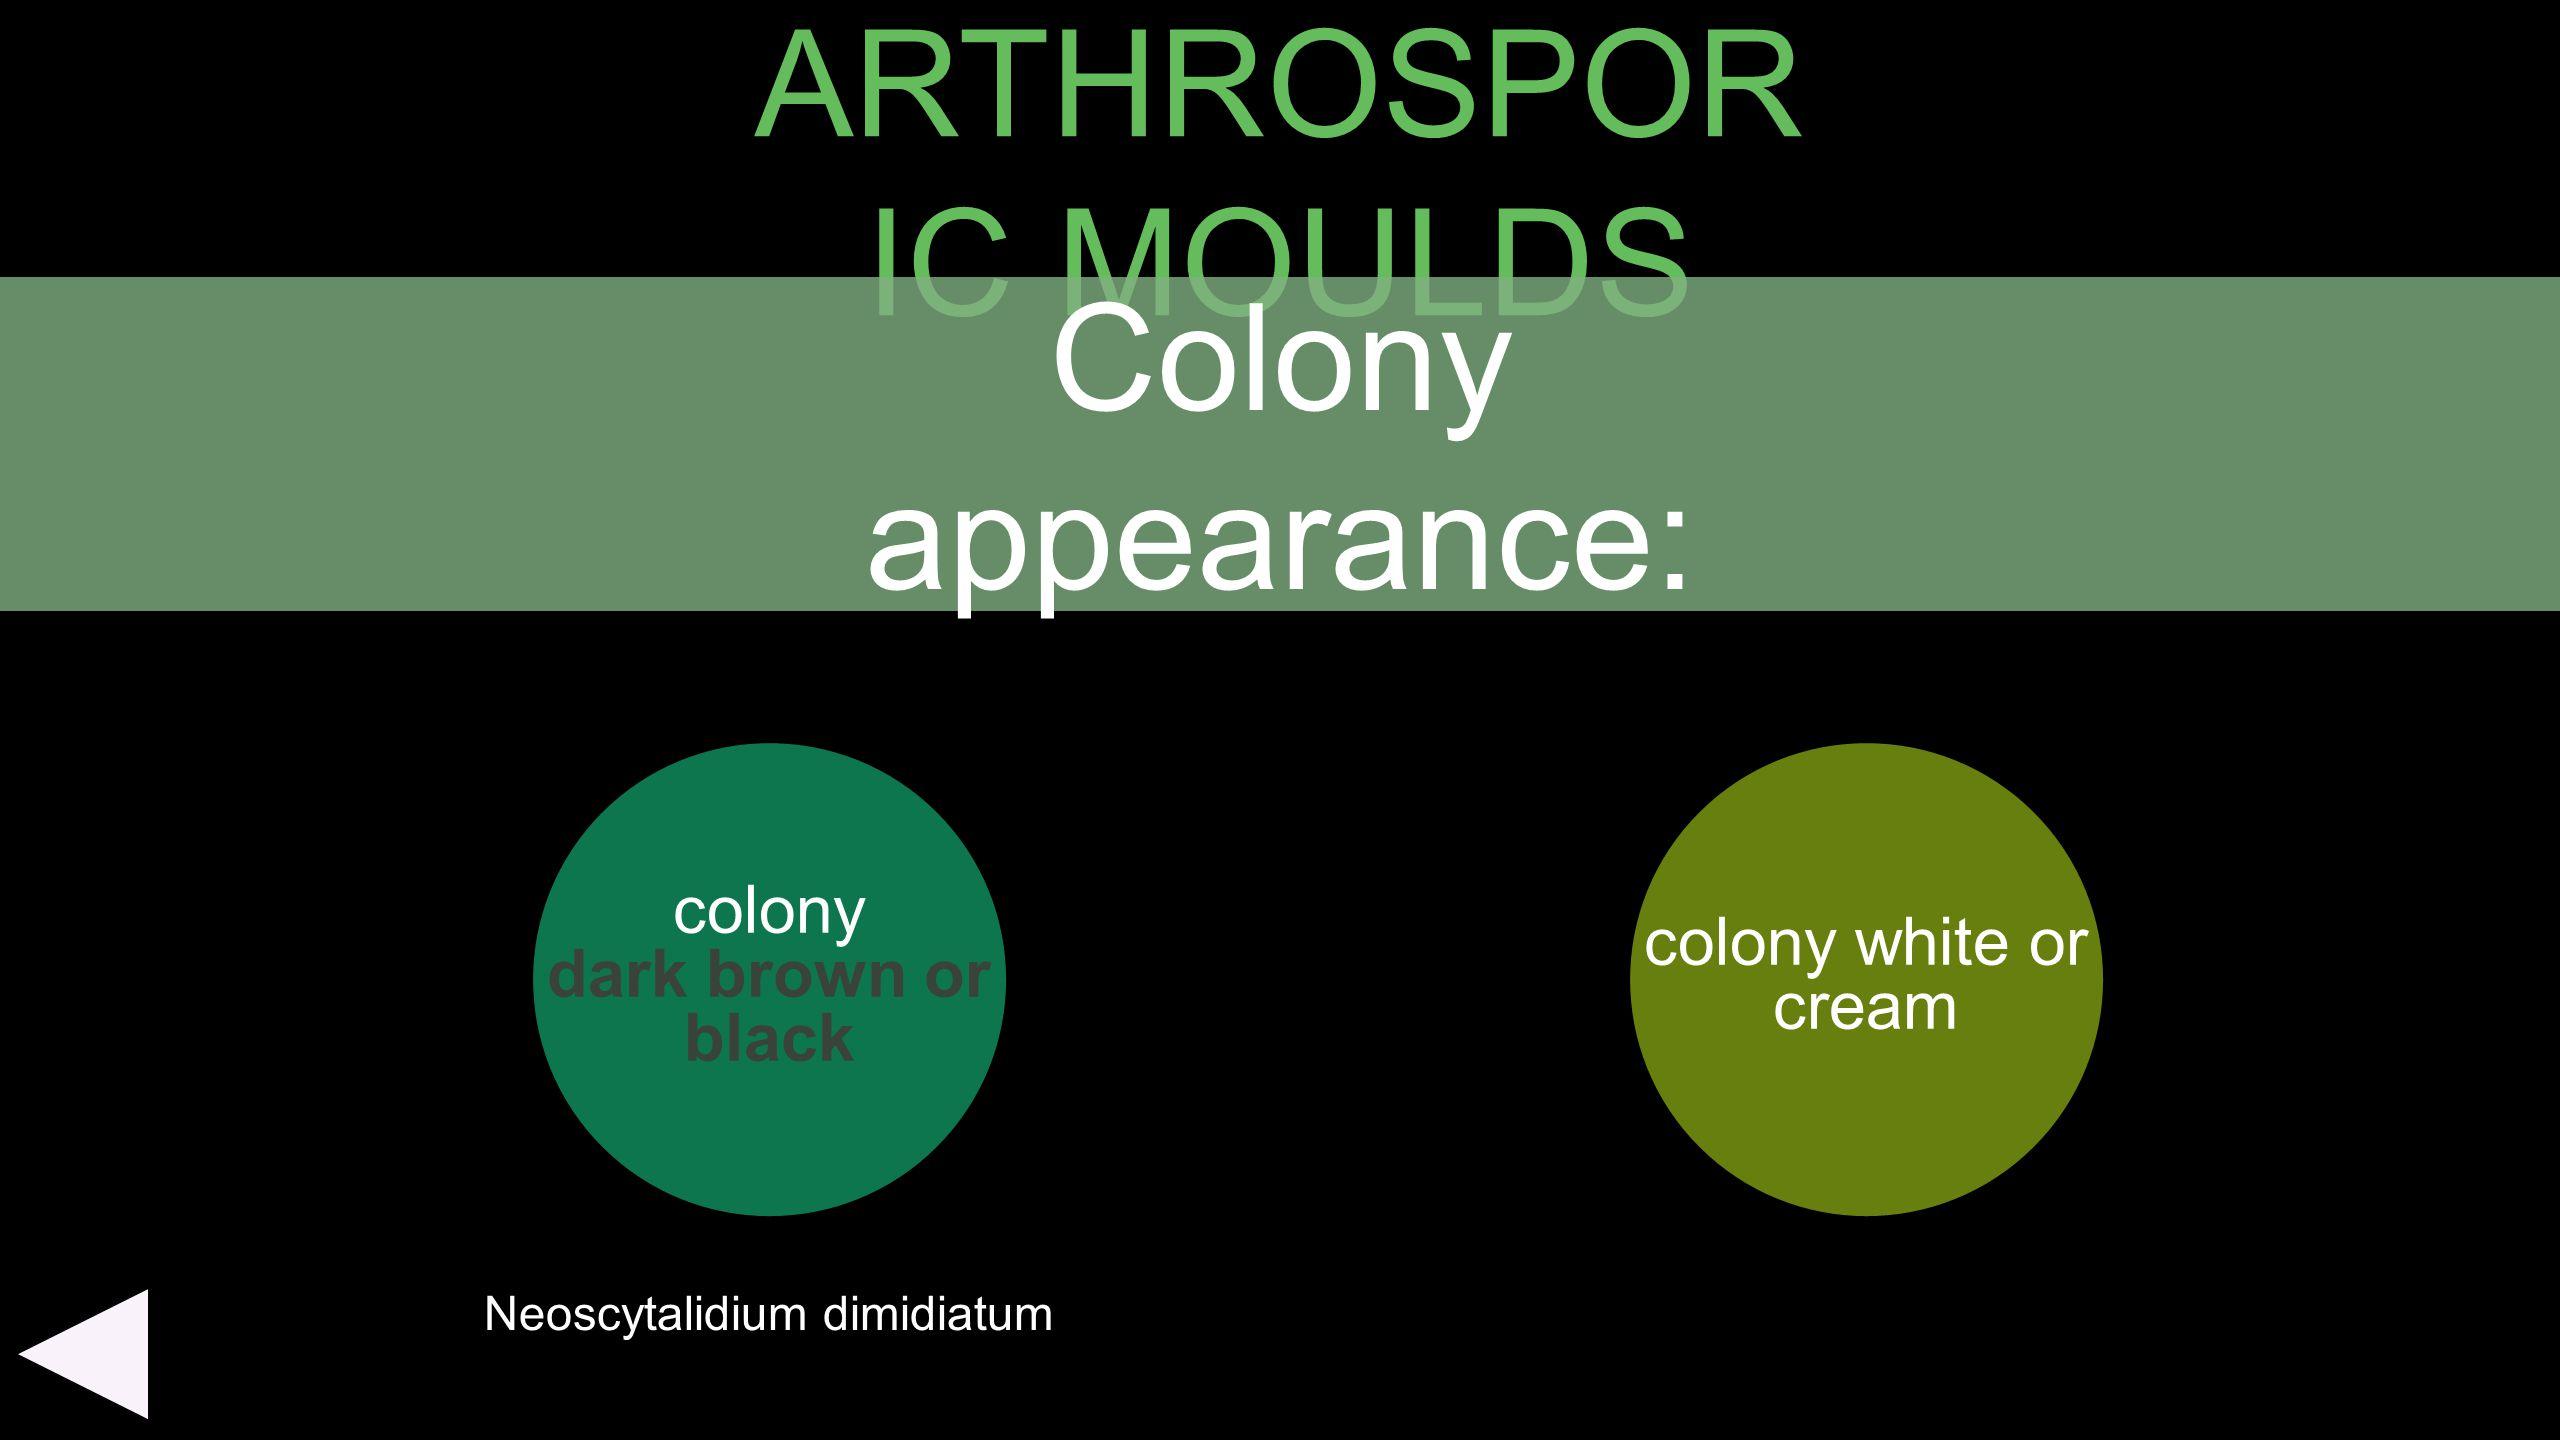 ARTHROSPOR IC MOULDS colony dark brown or black colony white or cream Colony appearance: Neoscytalidium dimidiatum